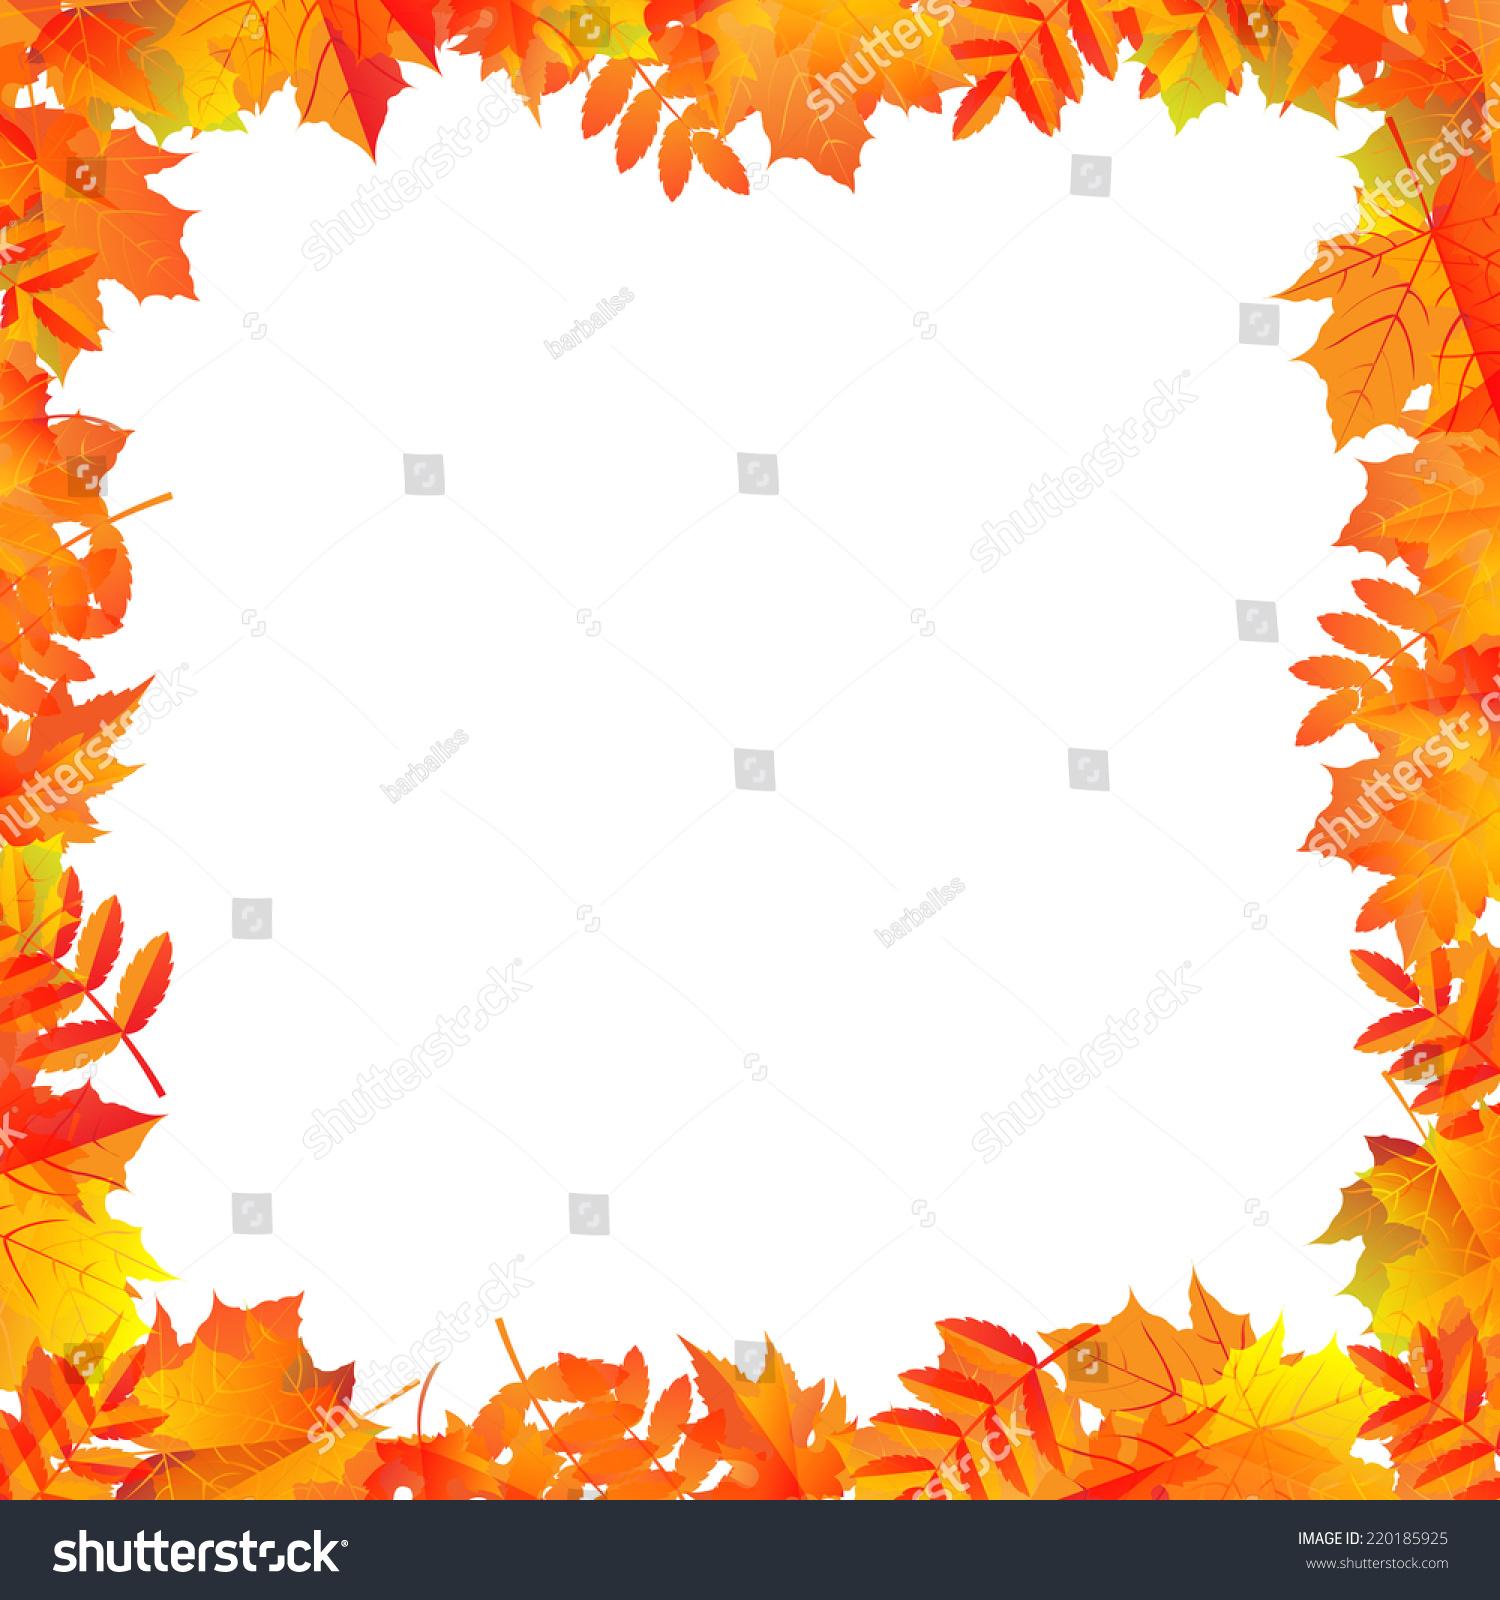 Autumn Leaves Border Gradient Mesh Vector Stock Vector ...